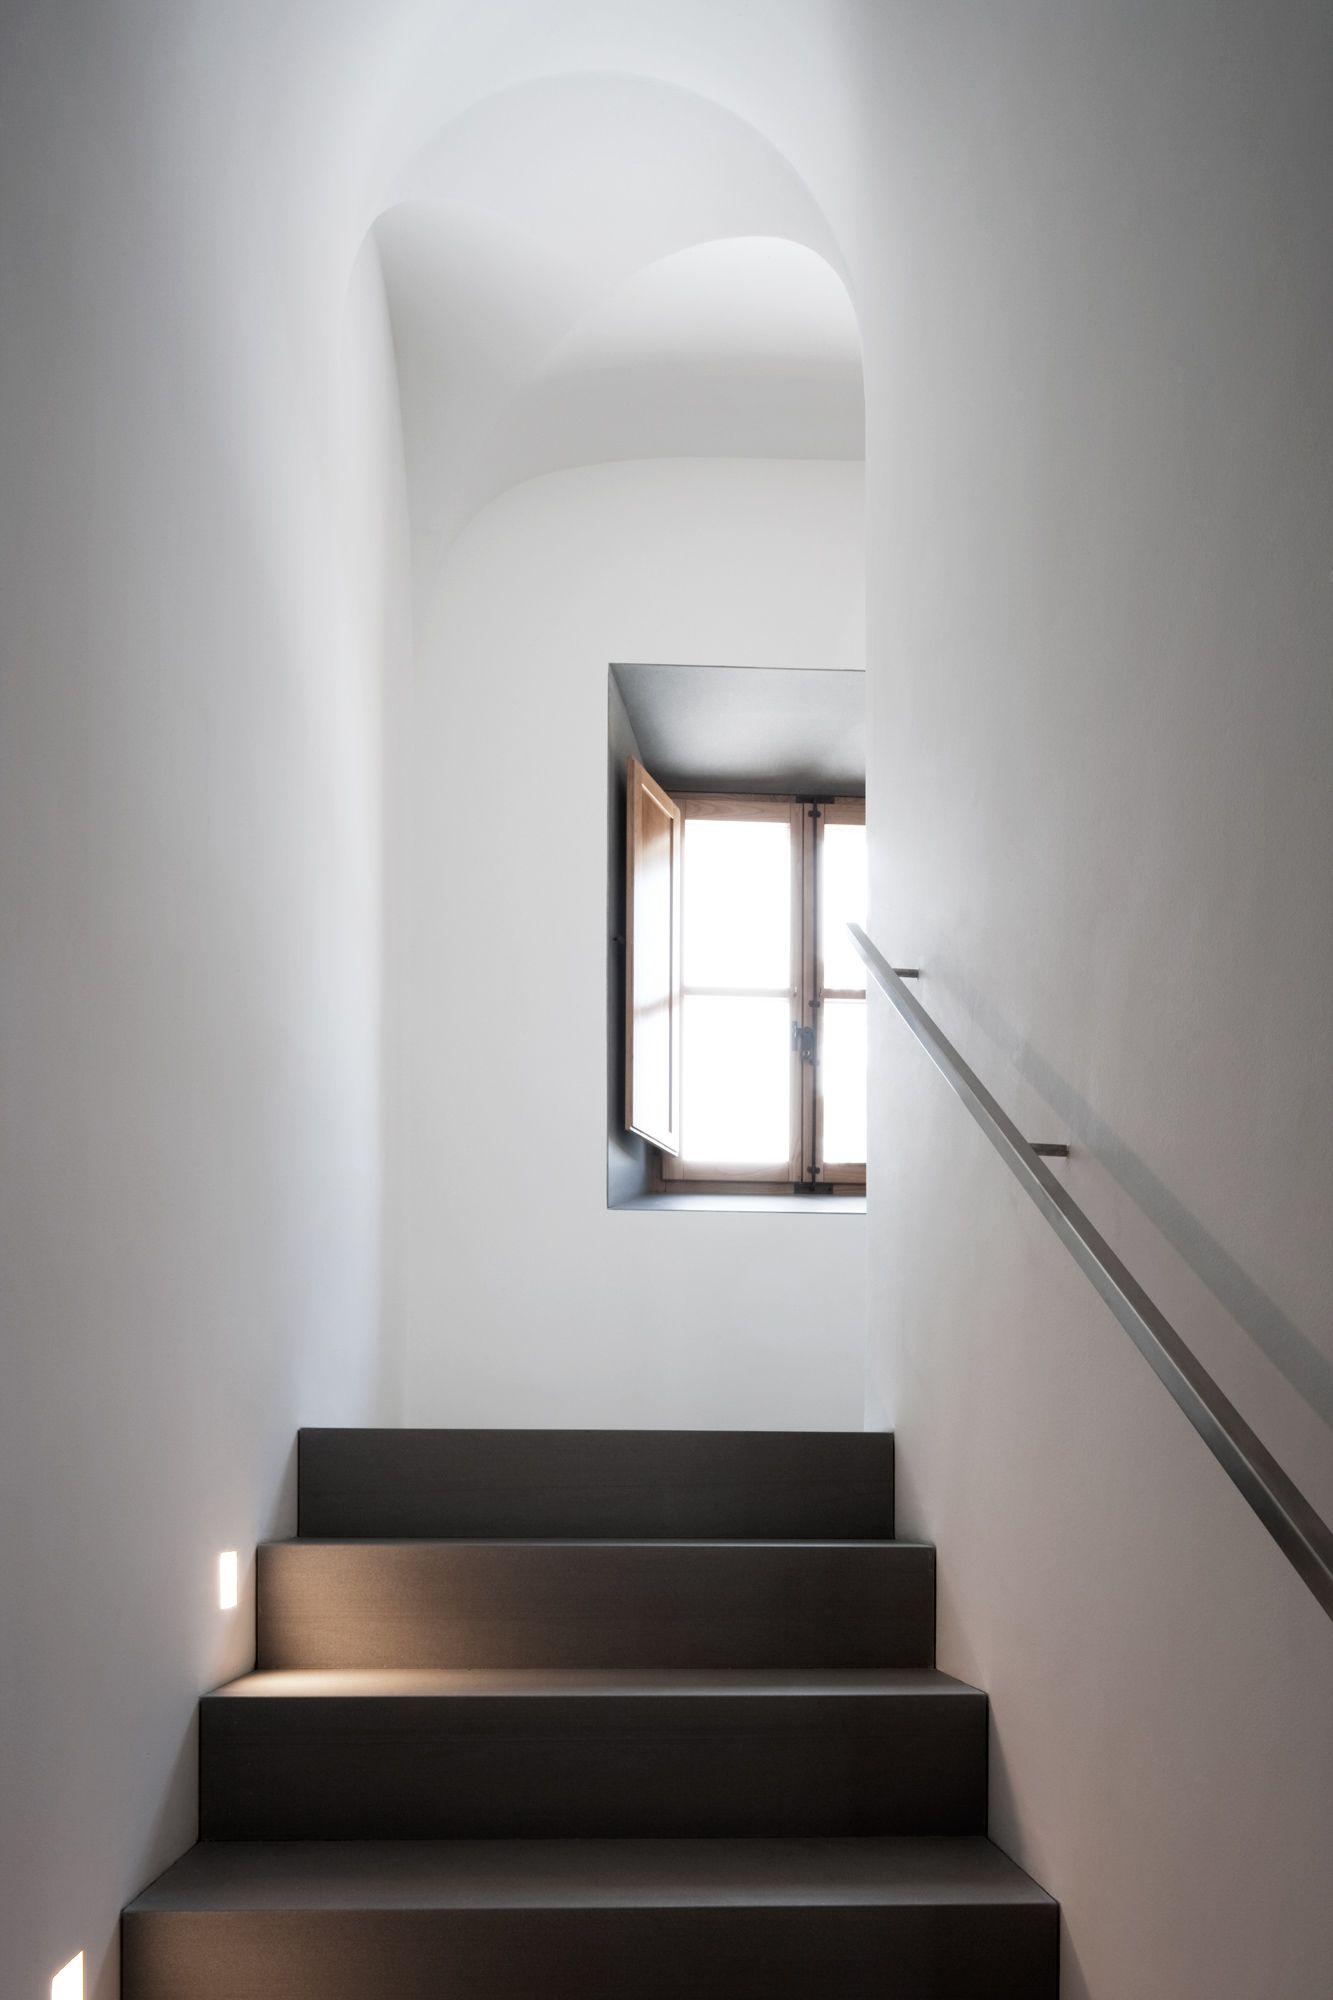 Stair light details john pawson montemaggio estate for John pawson lighting